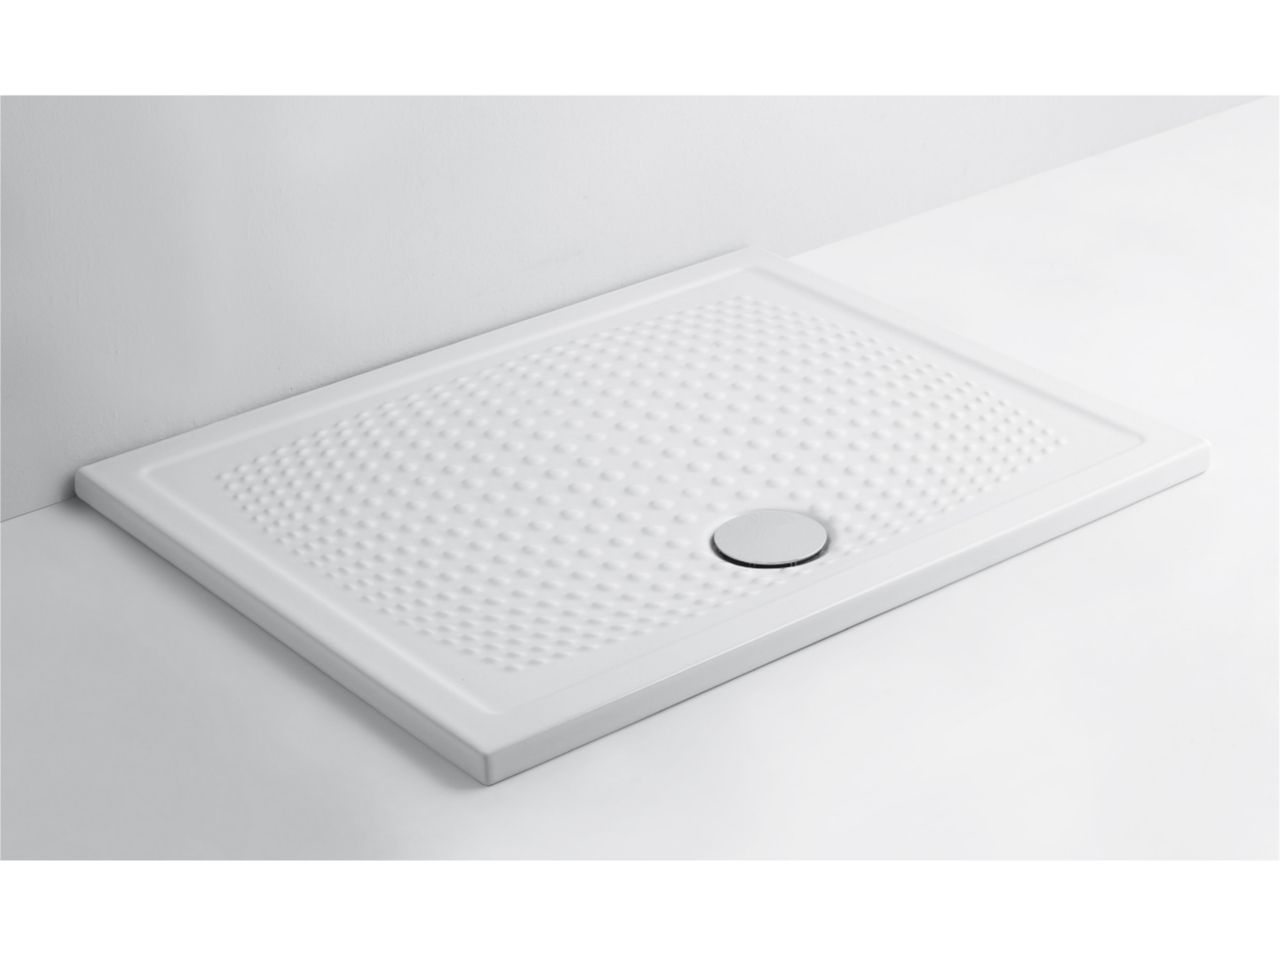 Piatto doccia energy 70x120xh3 5 bianco venduto da for Doccia iperceramica